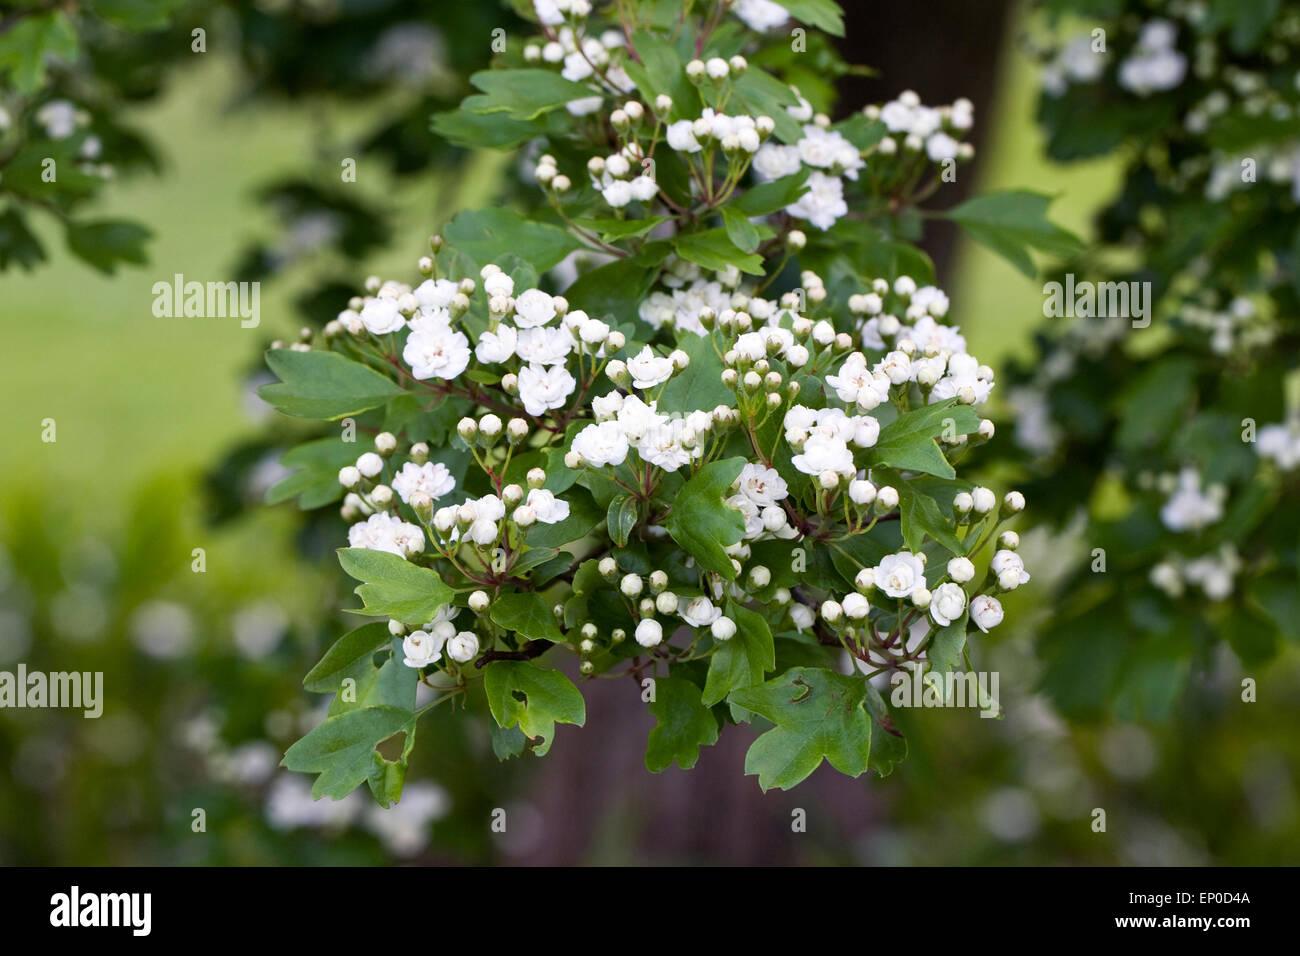 Crataegus Laevigata Plena Double White Hawthorn Flowers Stock